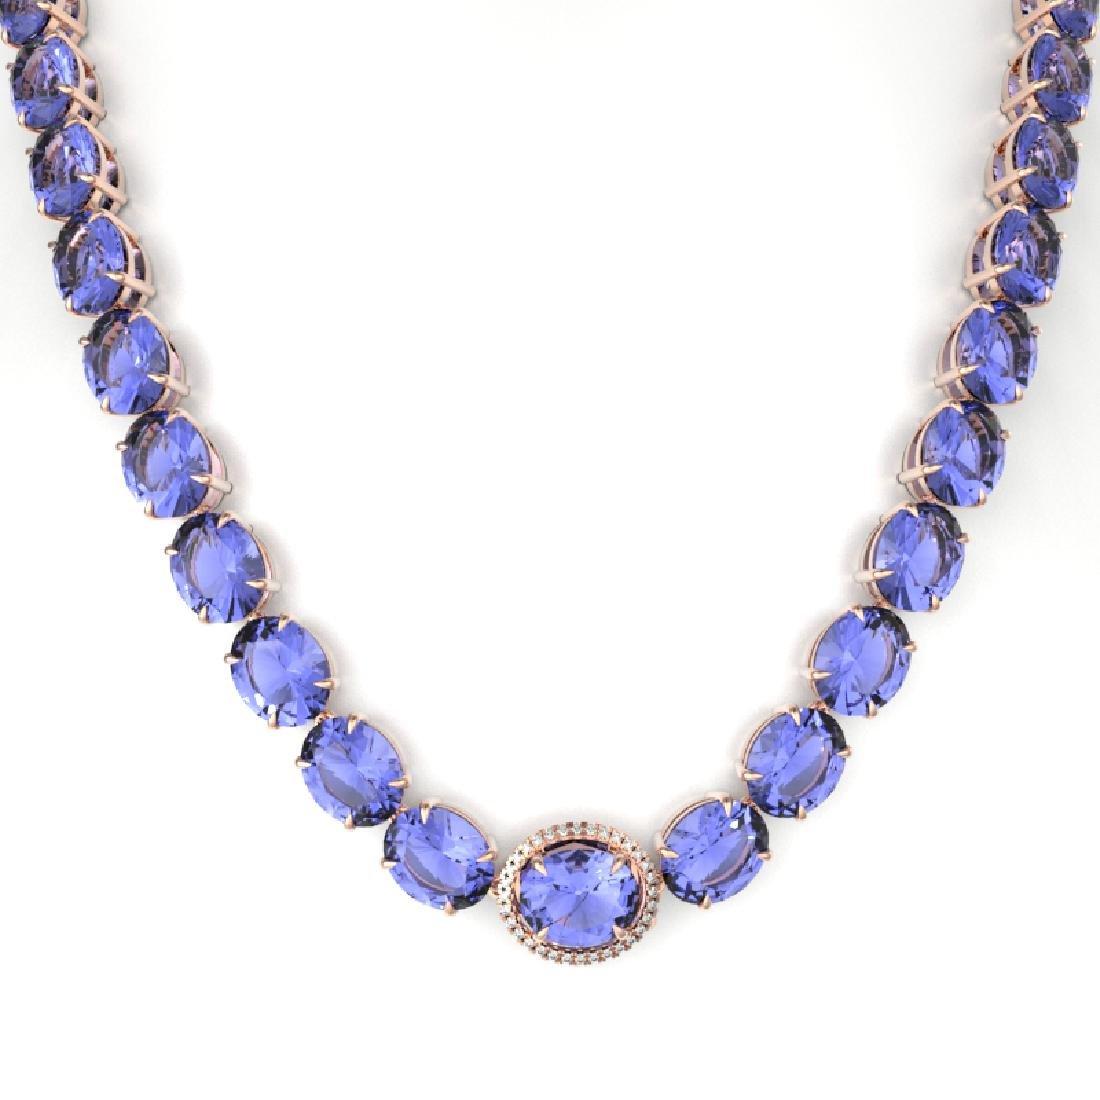 170 CTW Tanzanite & VS/SI Diamond Necklace 14K Rose - 2